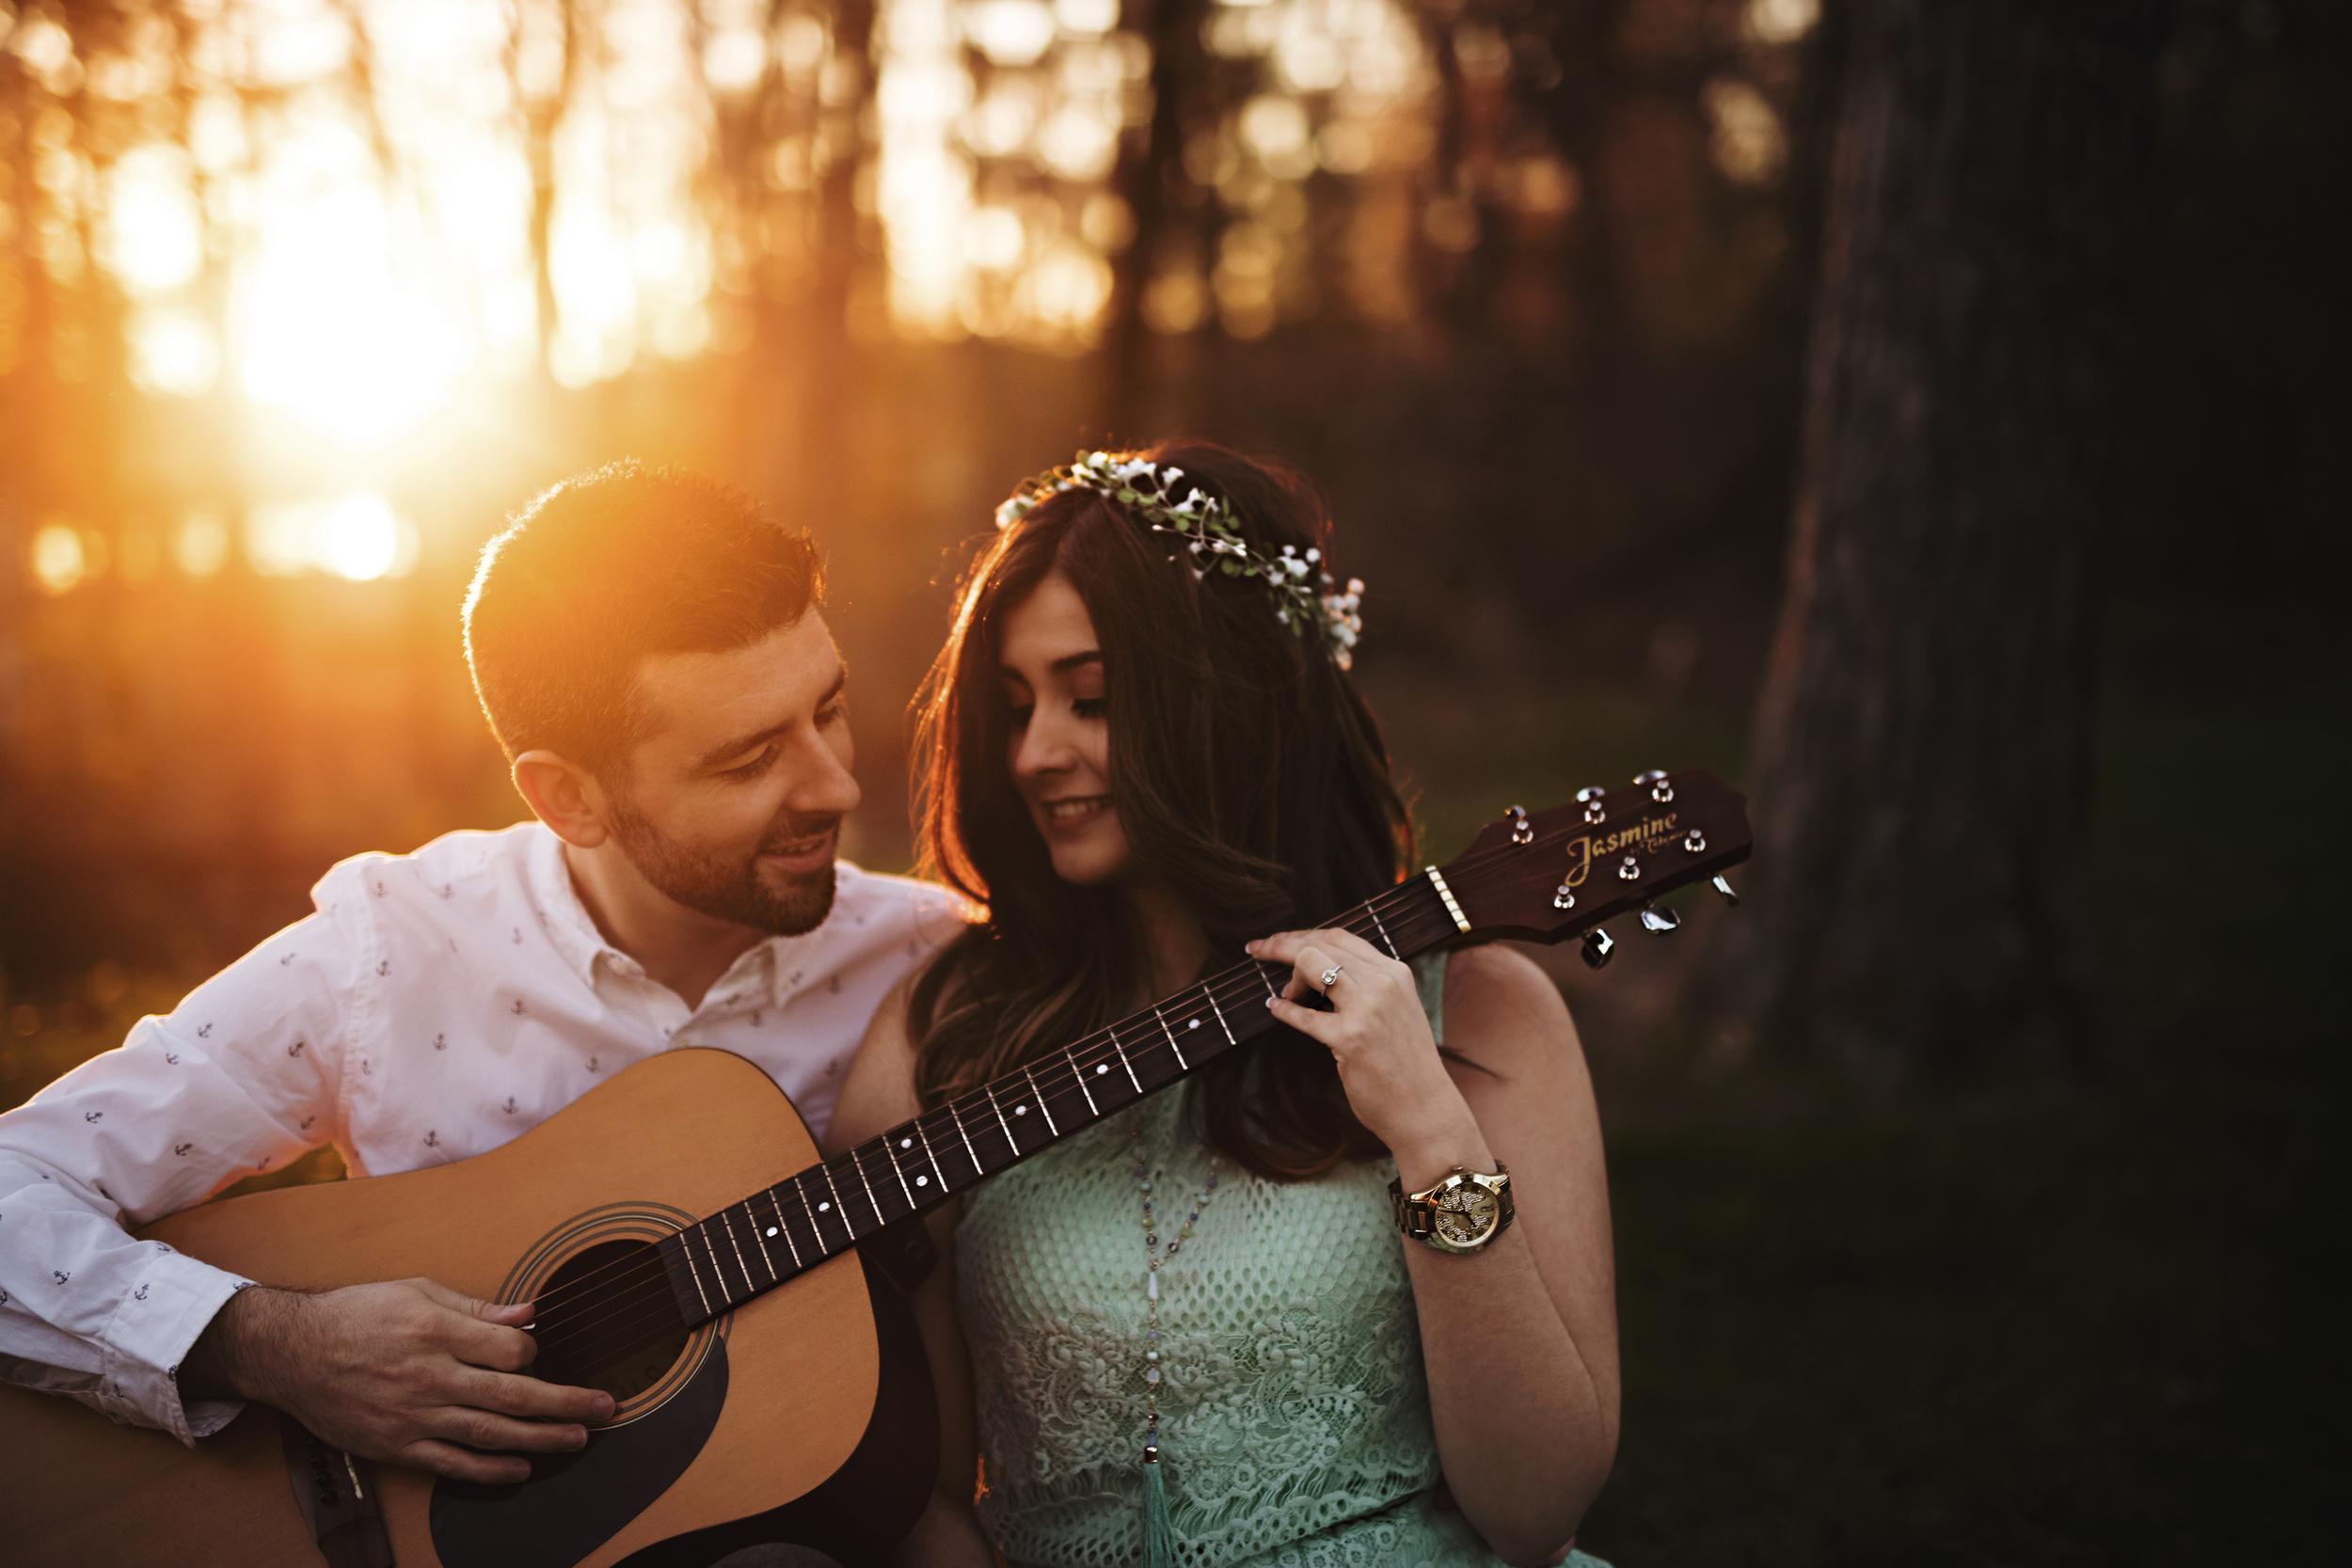 minneapolis-engagement-photographer-wedding-photography-2.jpg